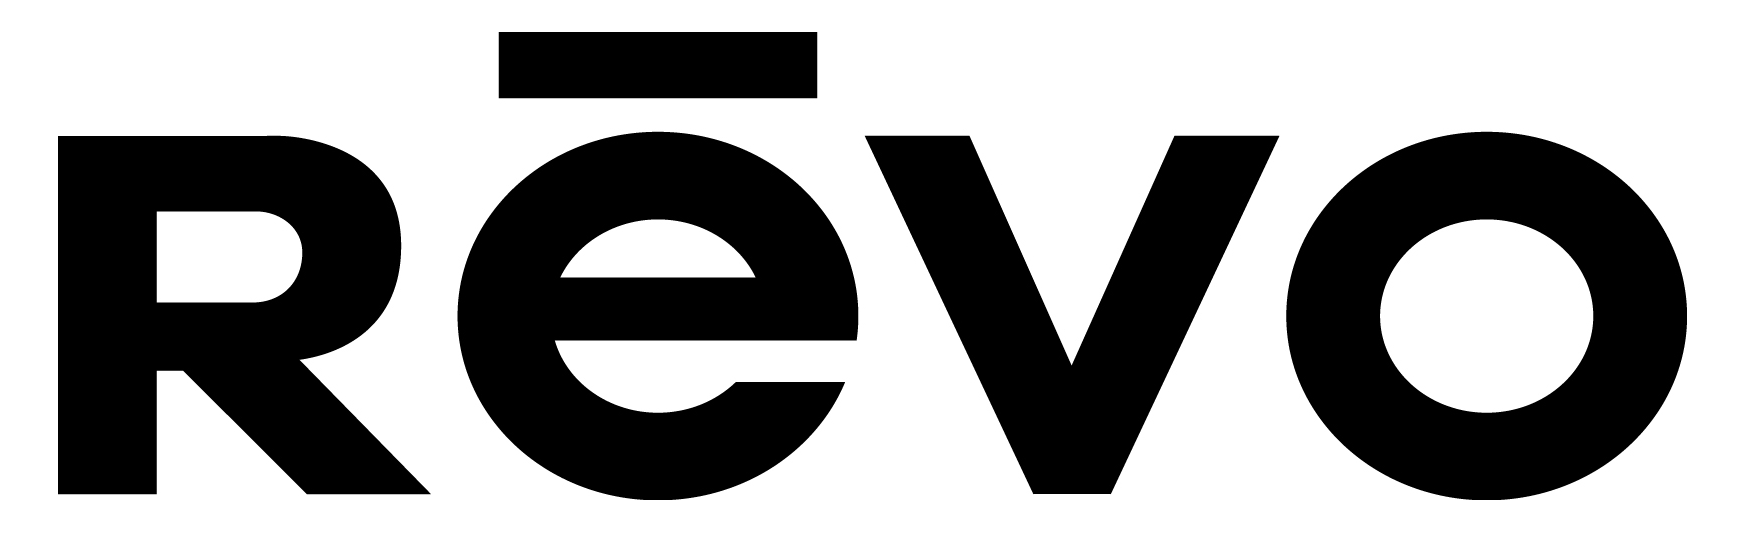 Revo_logo.png